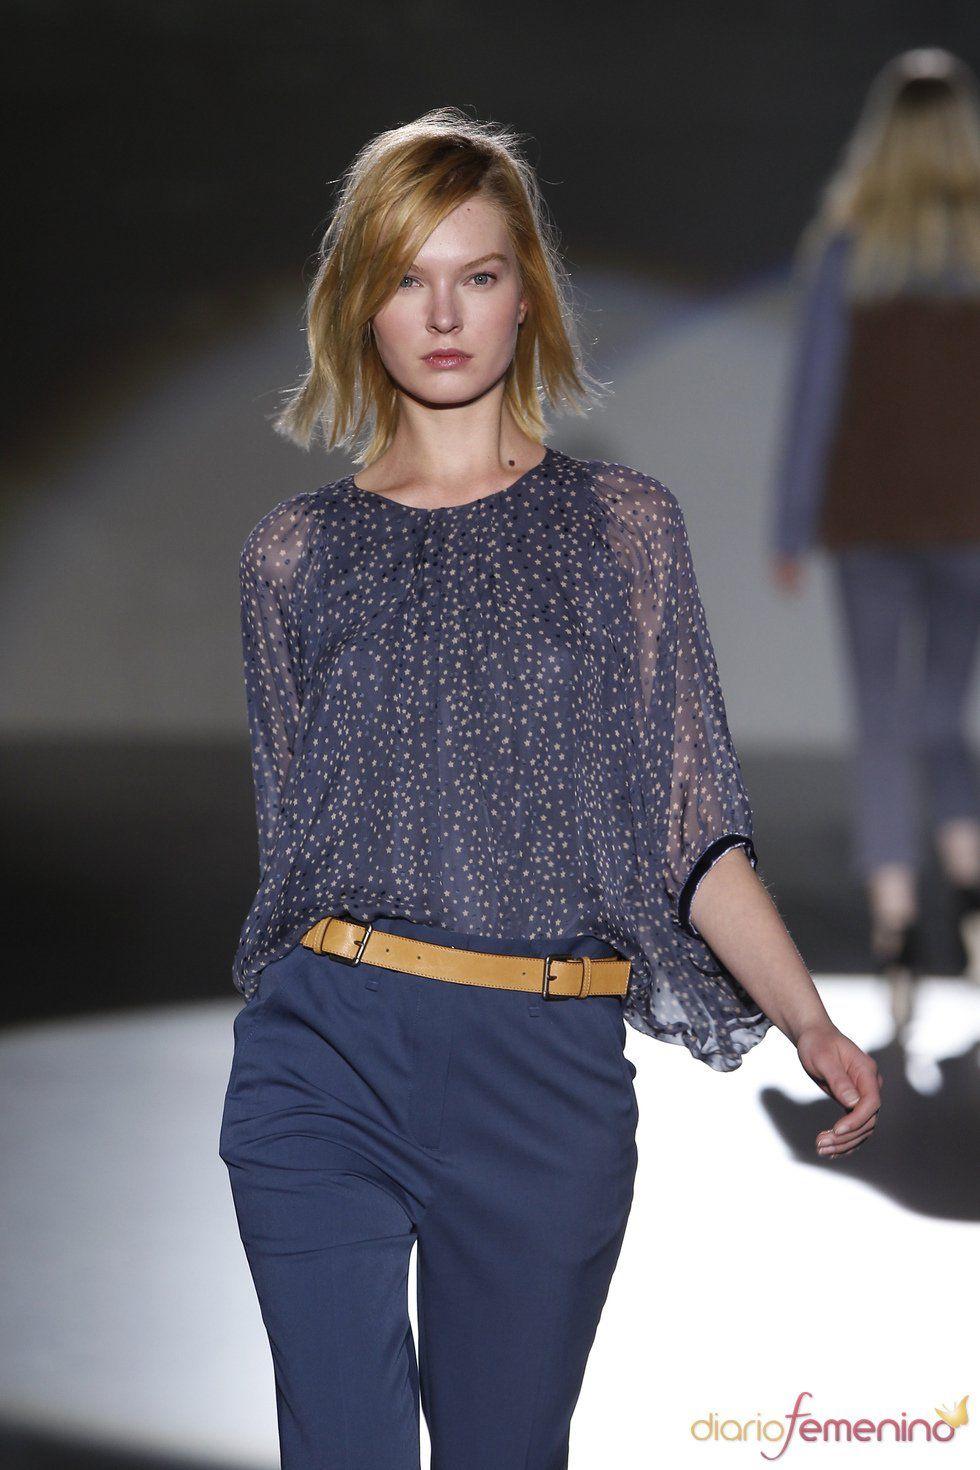 blusas estampadas - Buscar con Google   fashion   Pinterest   Blusas ...